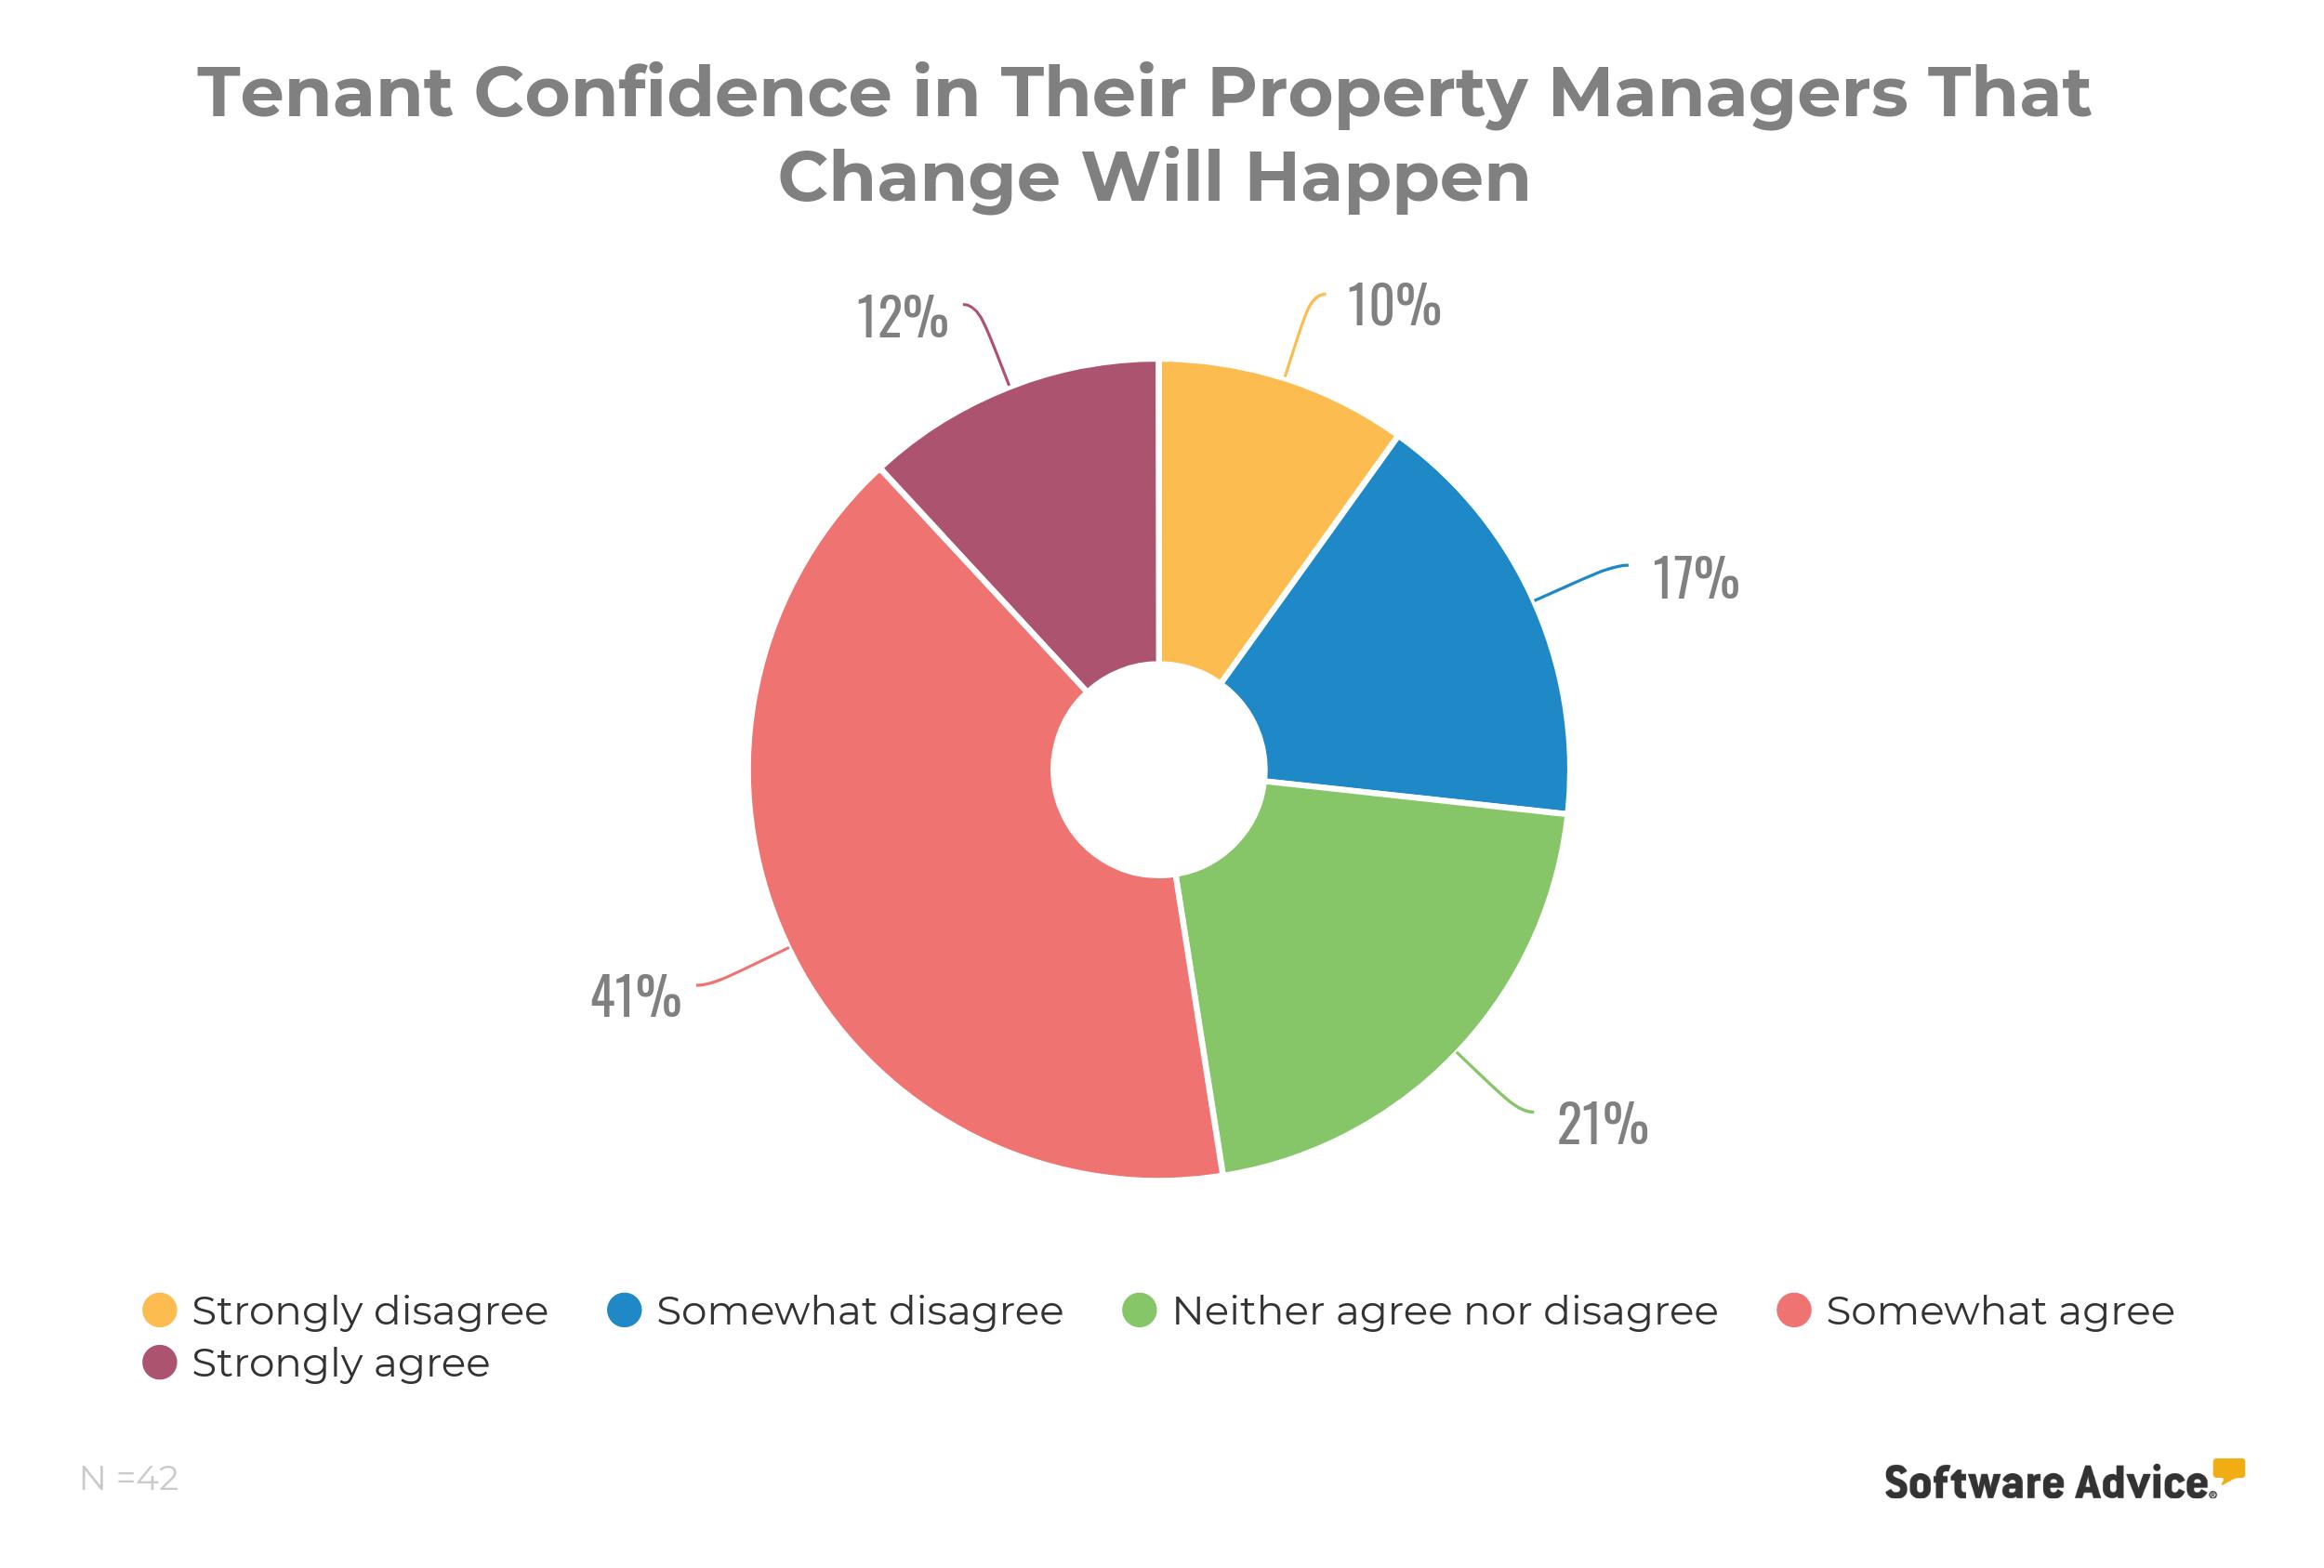 Tenant satisfaction survey result